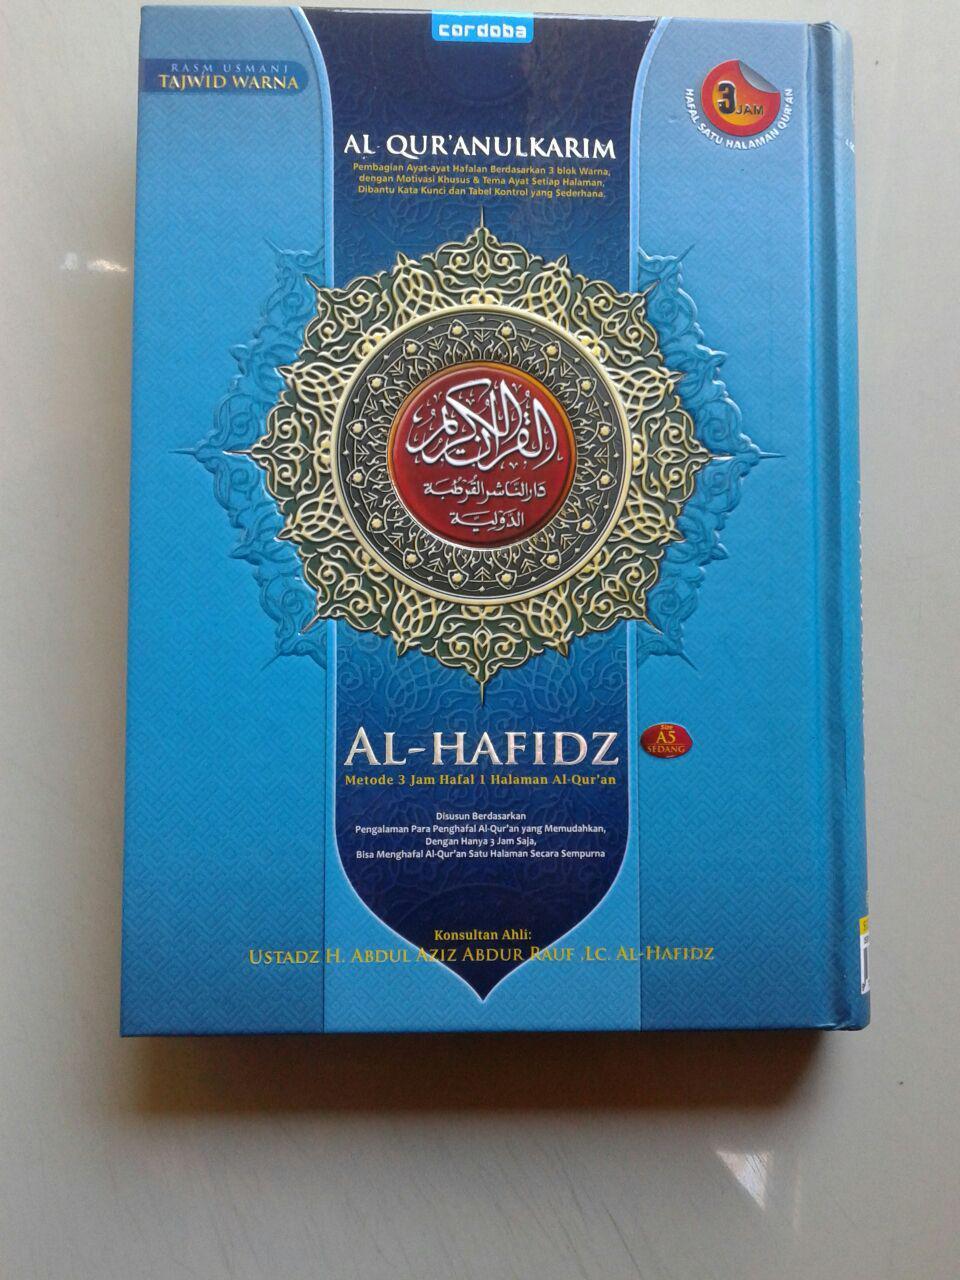 Al-Qur'an Hafalan Al-Hafidz Metode 3 jam Hafal 1 Halaman Ukuran A5 cover